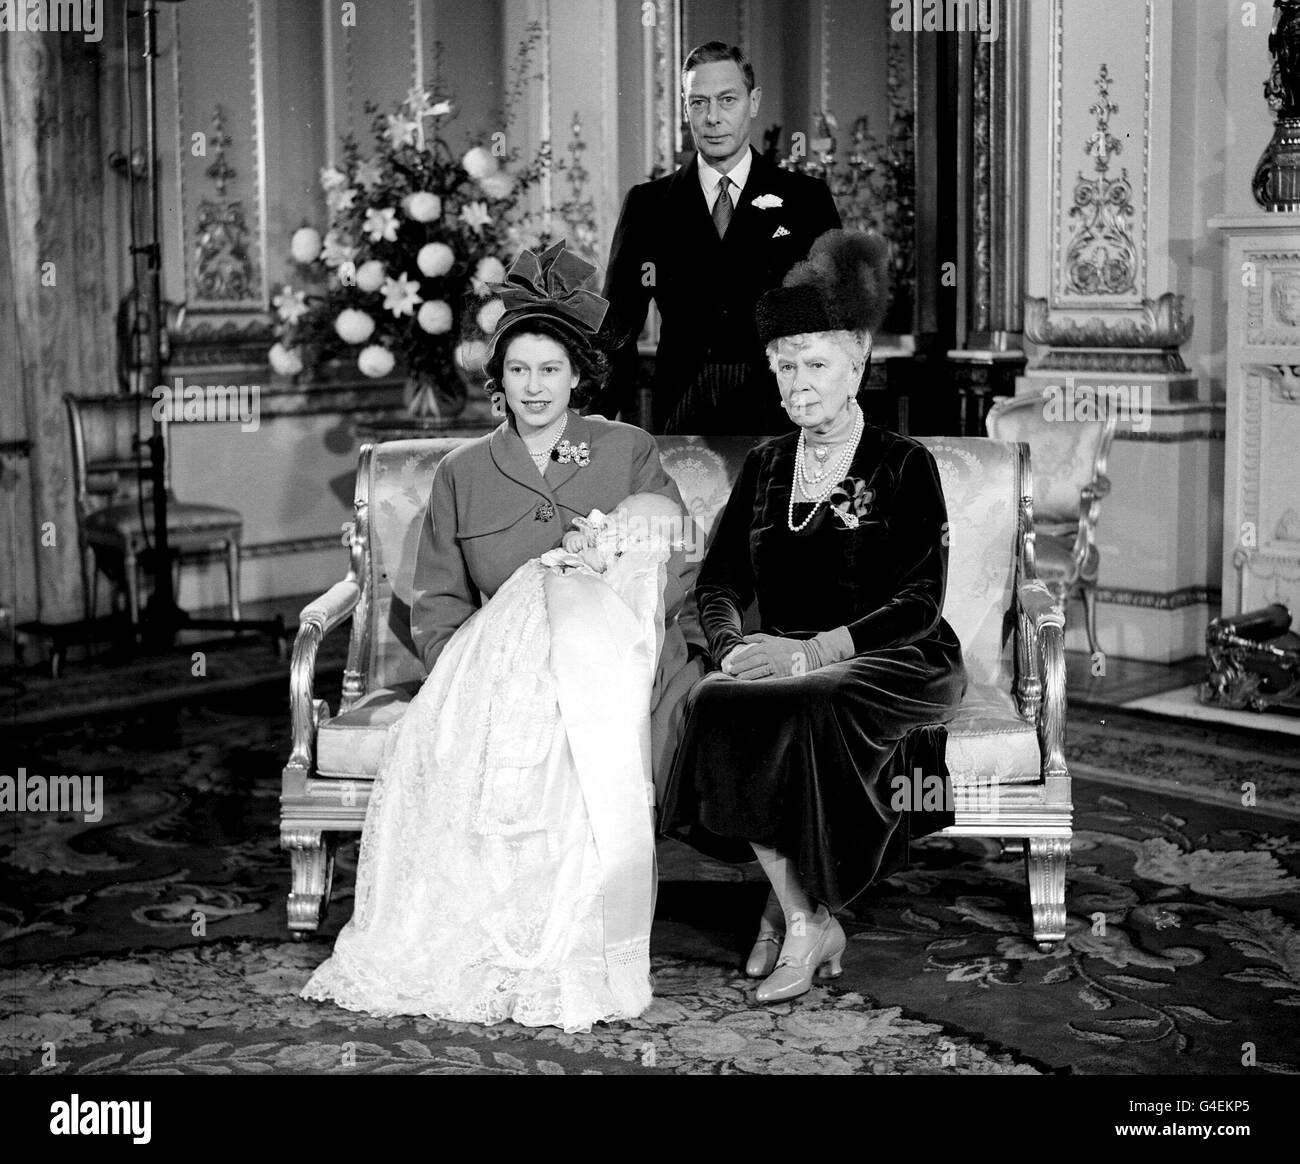 Royalty Taufe Von Prinz Charles Buckingham Palace